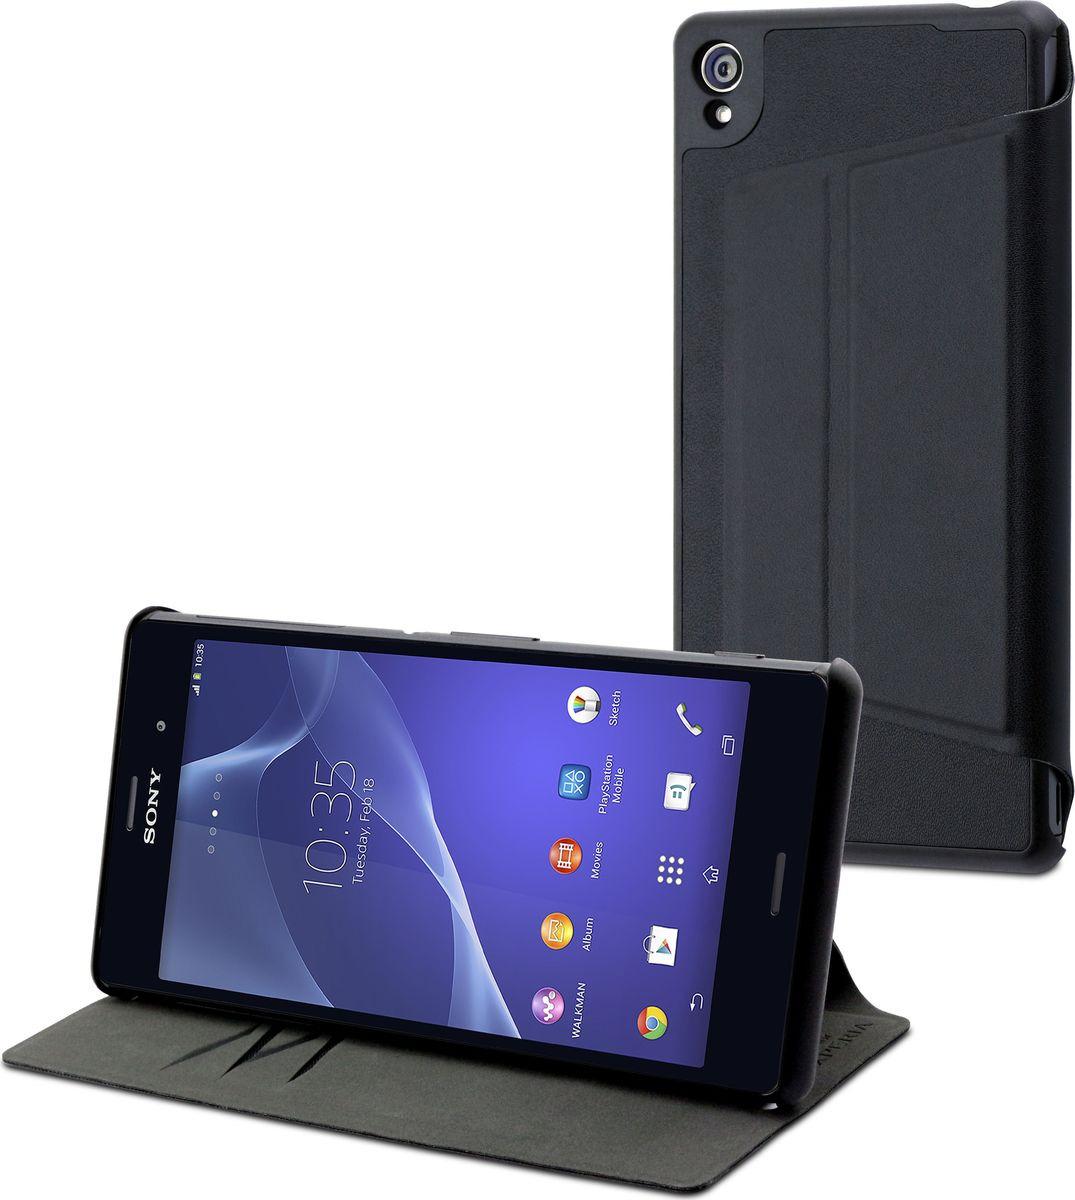 Чехол для сотового телефона Muvit MFX Stand Folio для Sony Xperia Z3, SESLI0130, черный цена